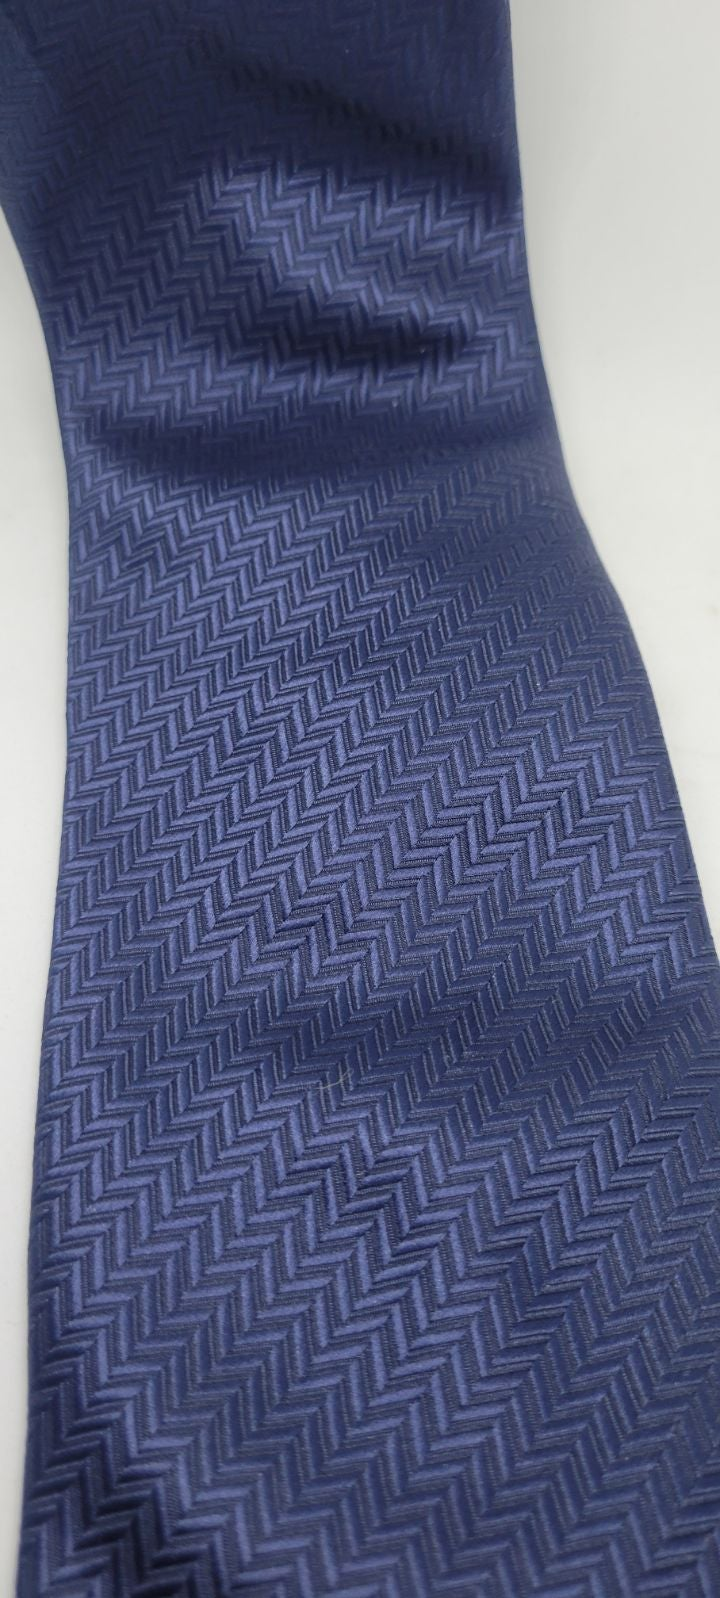 Blue patterned Men's tie